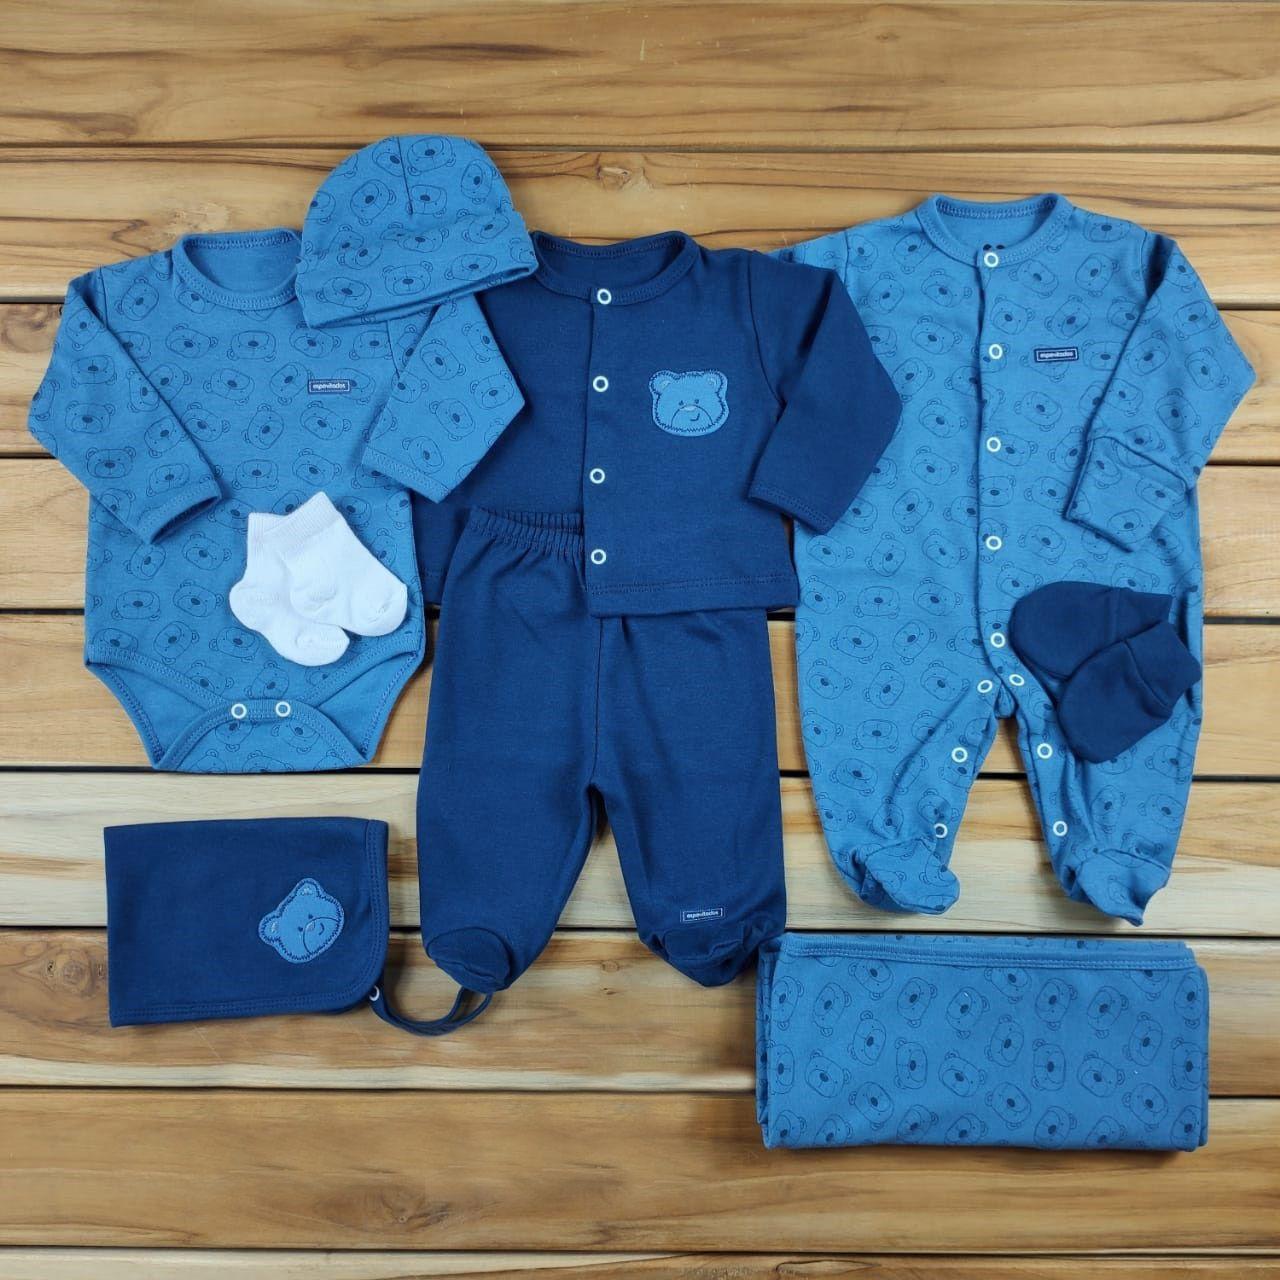 Kit Maternidade Azul - 9 Peças